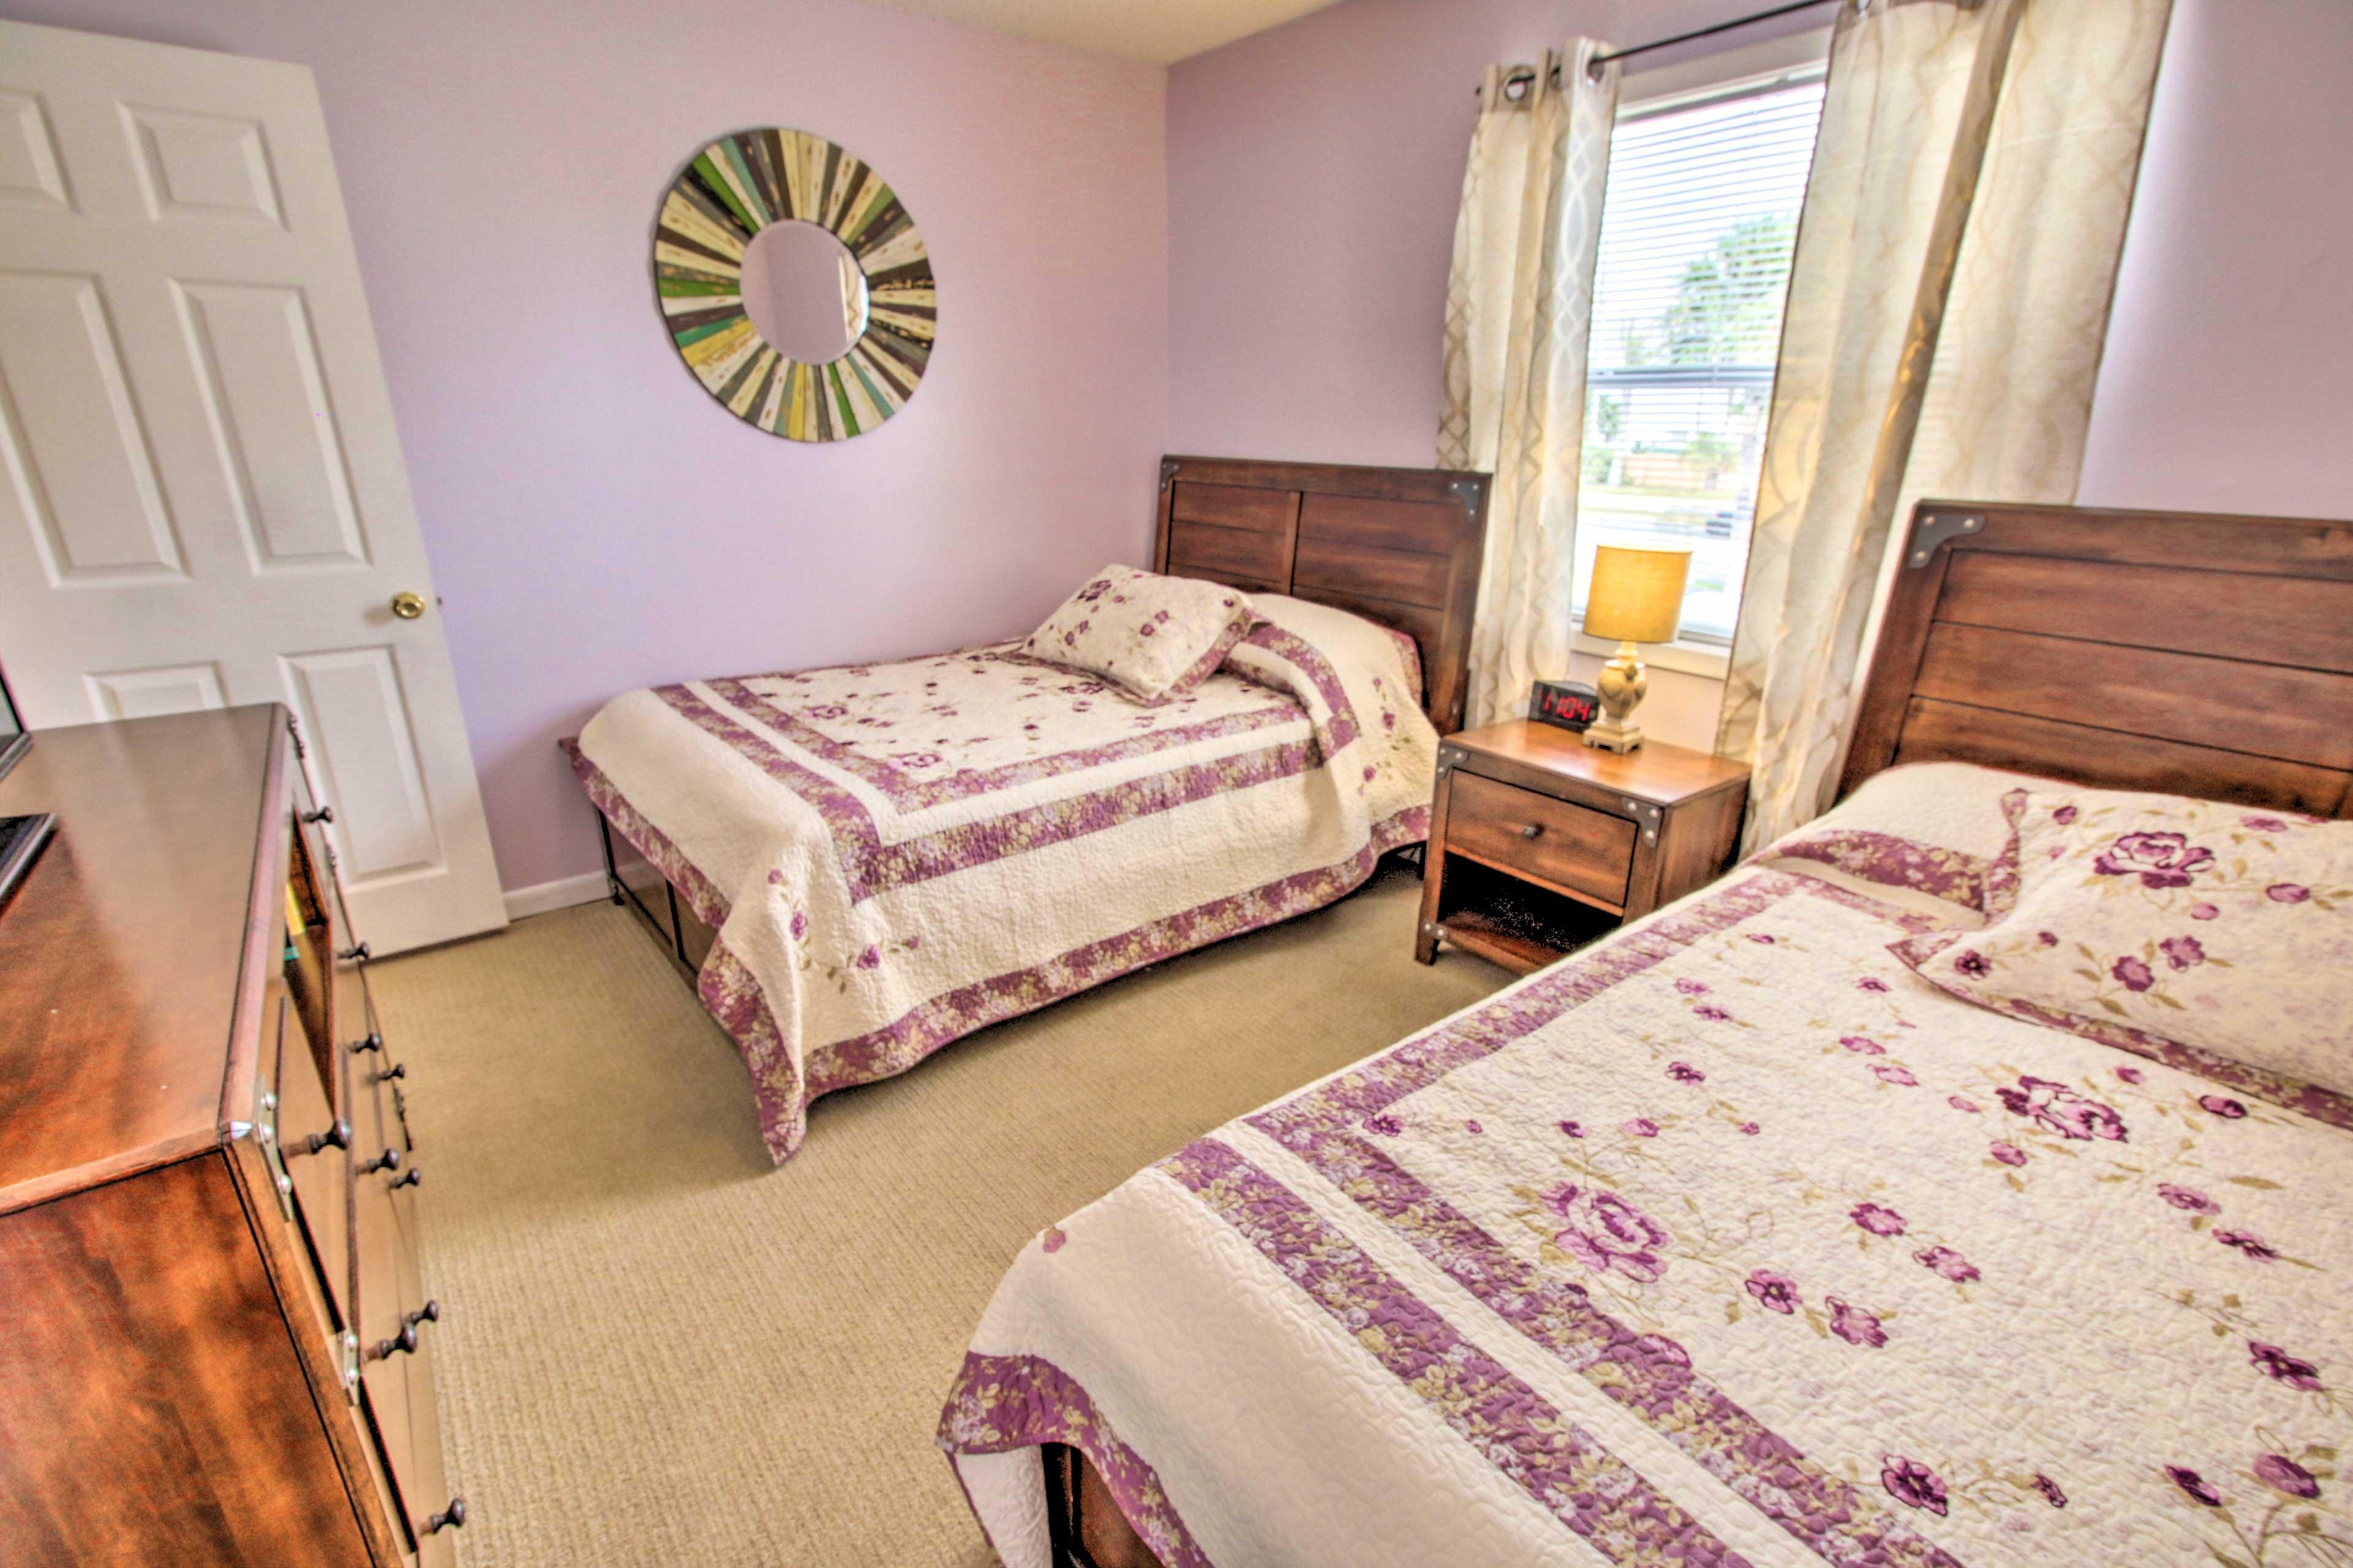 Bedroom 2 | 2 Full Beds | Linens Provided